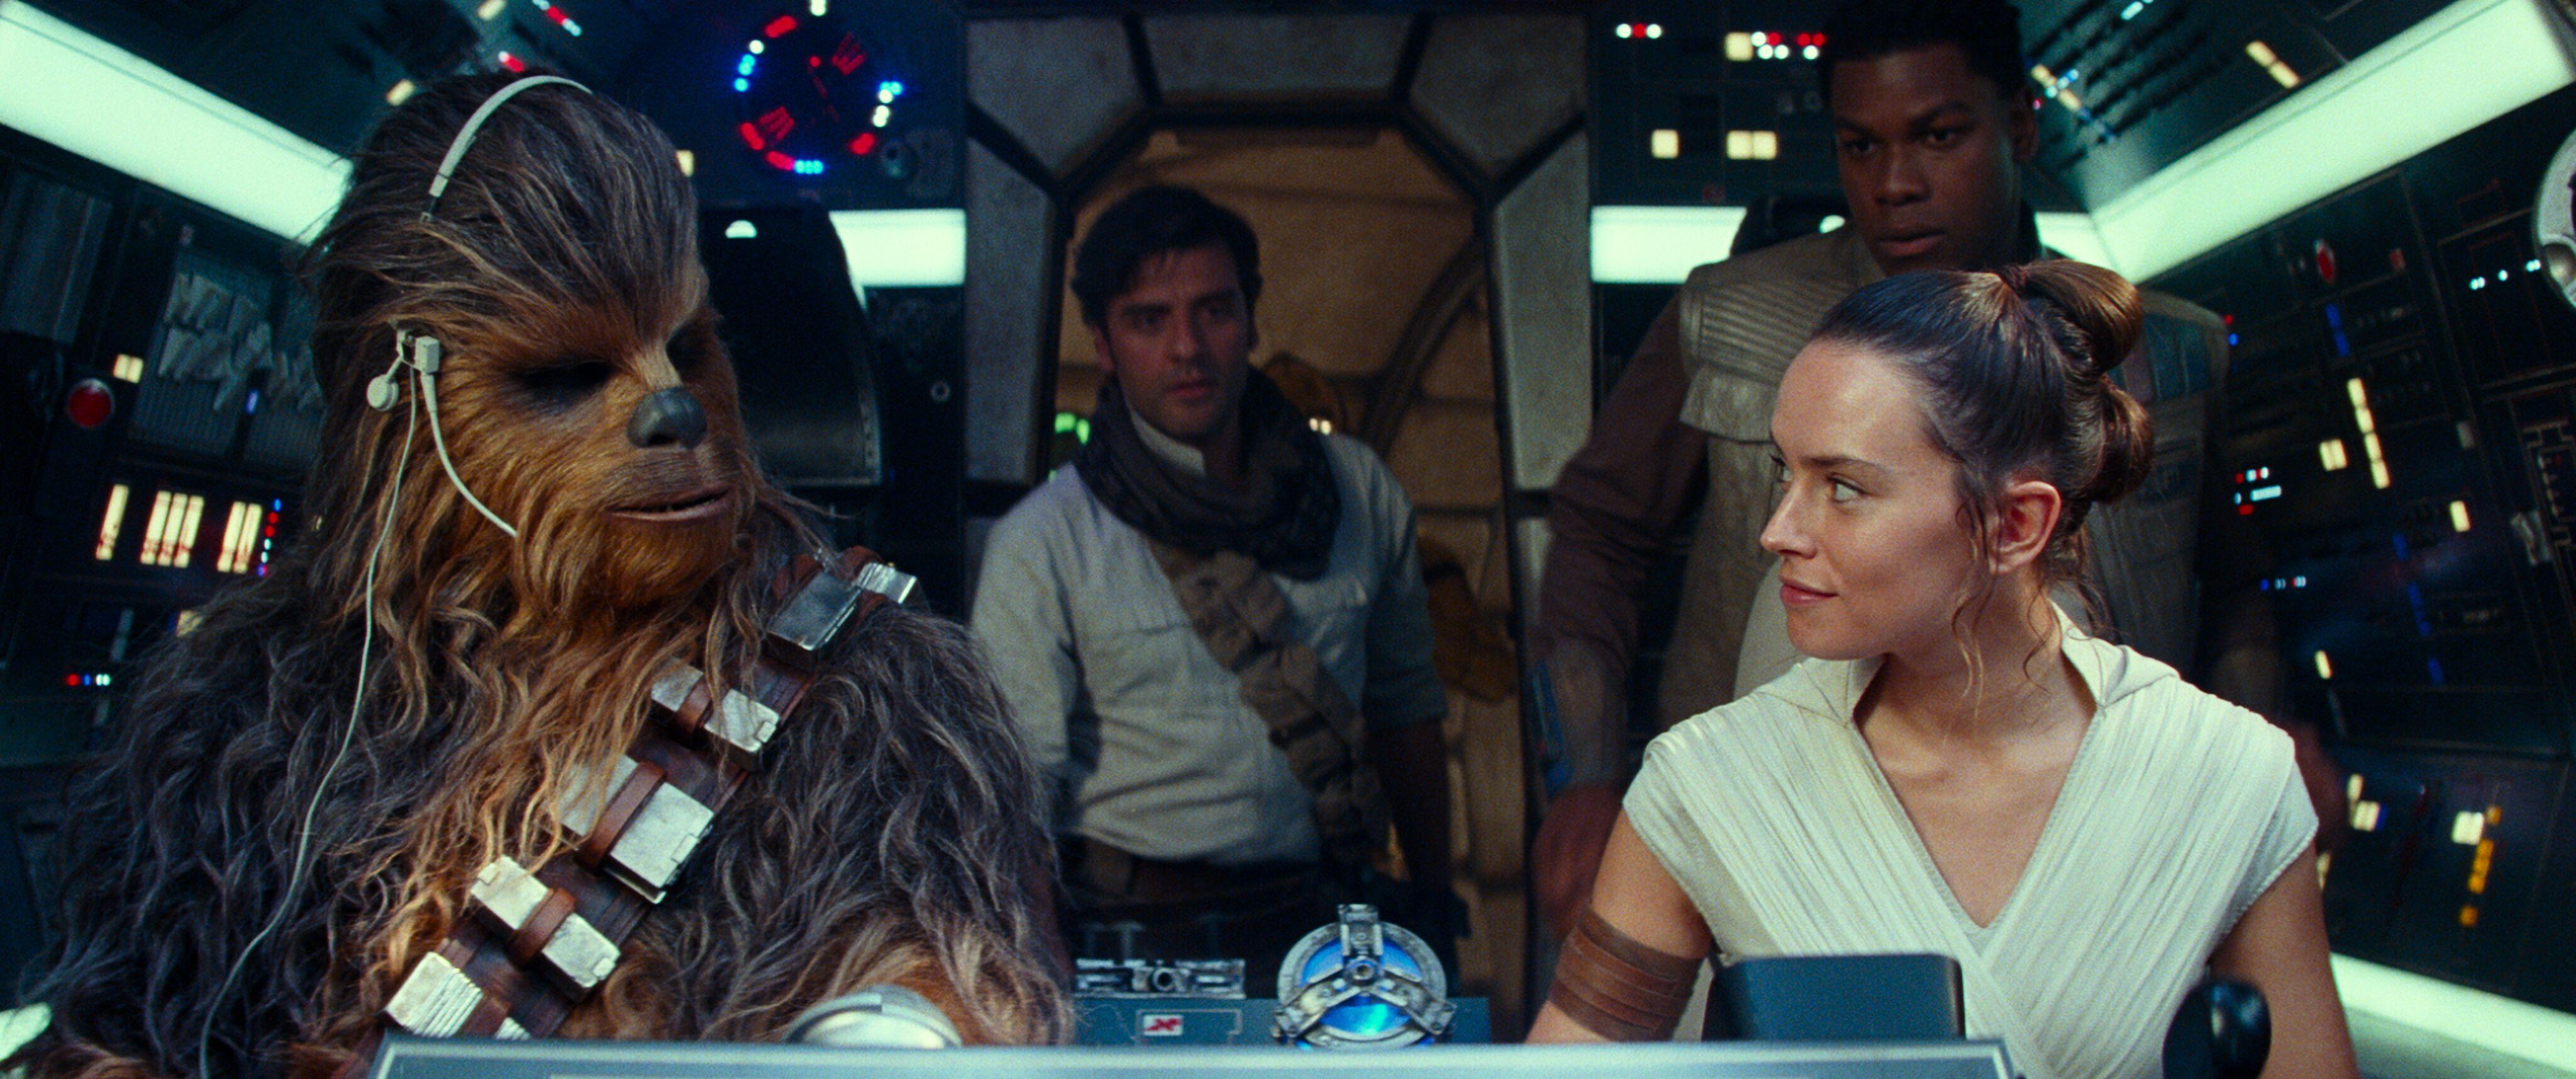 Details of Colin Trevorrow's rumored Star Wars: Episode IX script surface online